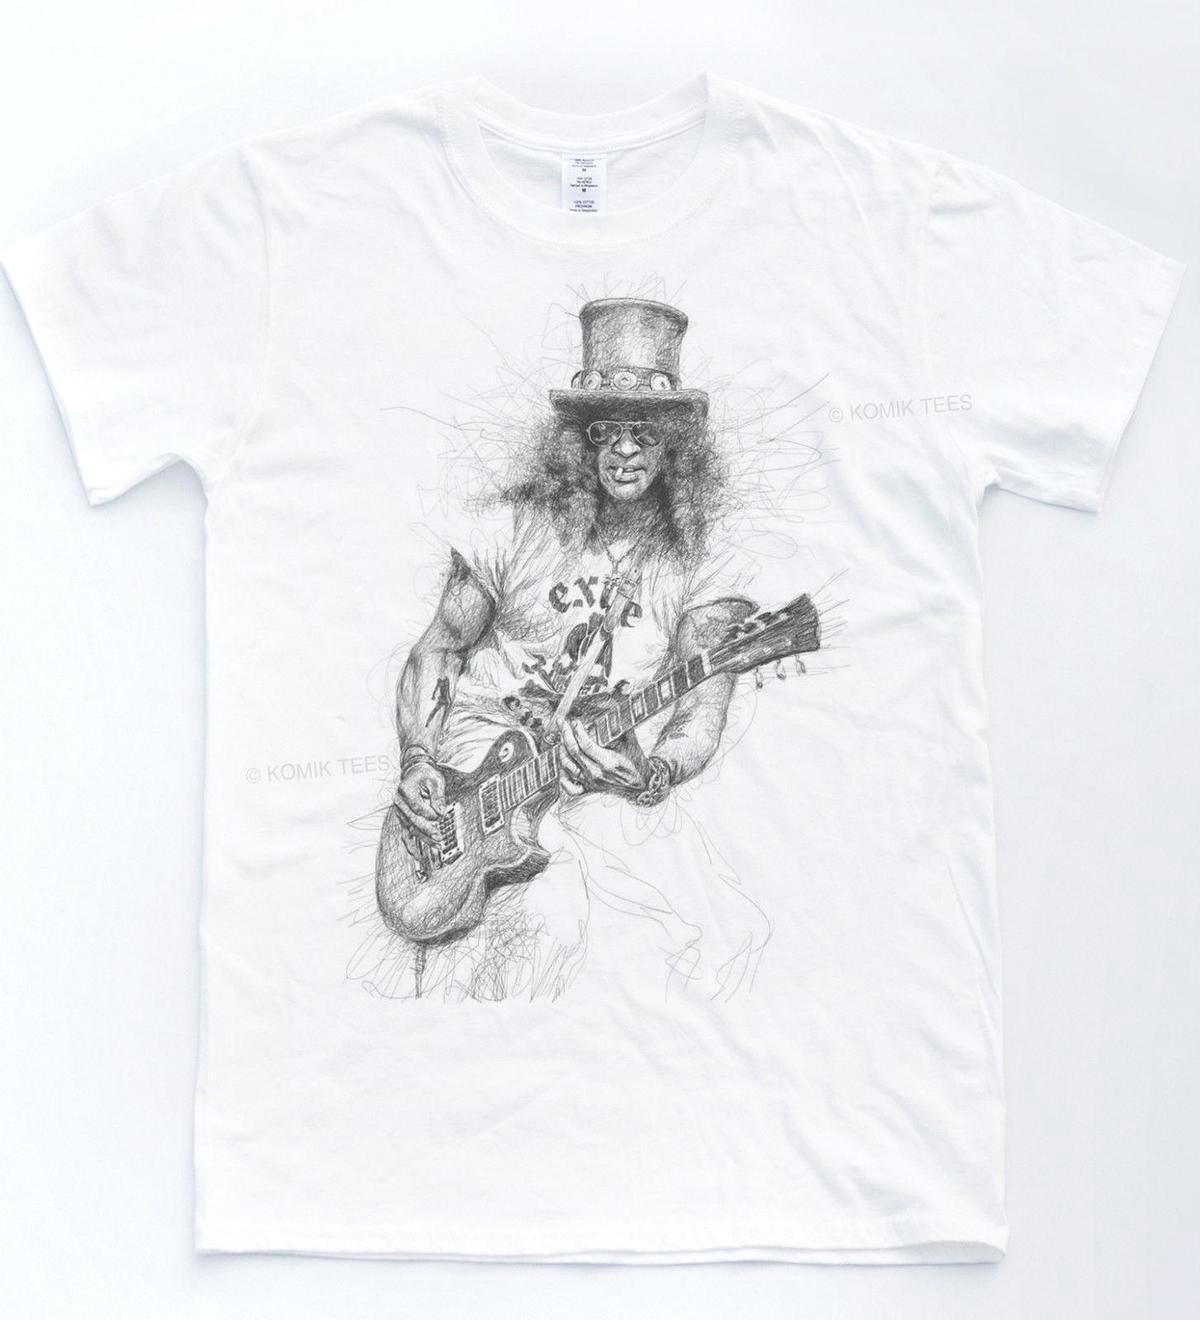 slash sketch t shirt rock music guns velvet roses tee indie music revolver top suit hat pink t shirt hilarious tee shirts online t shirt buy from lijian78